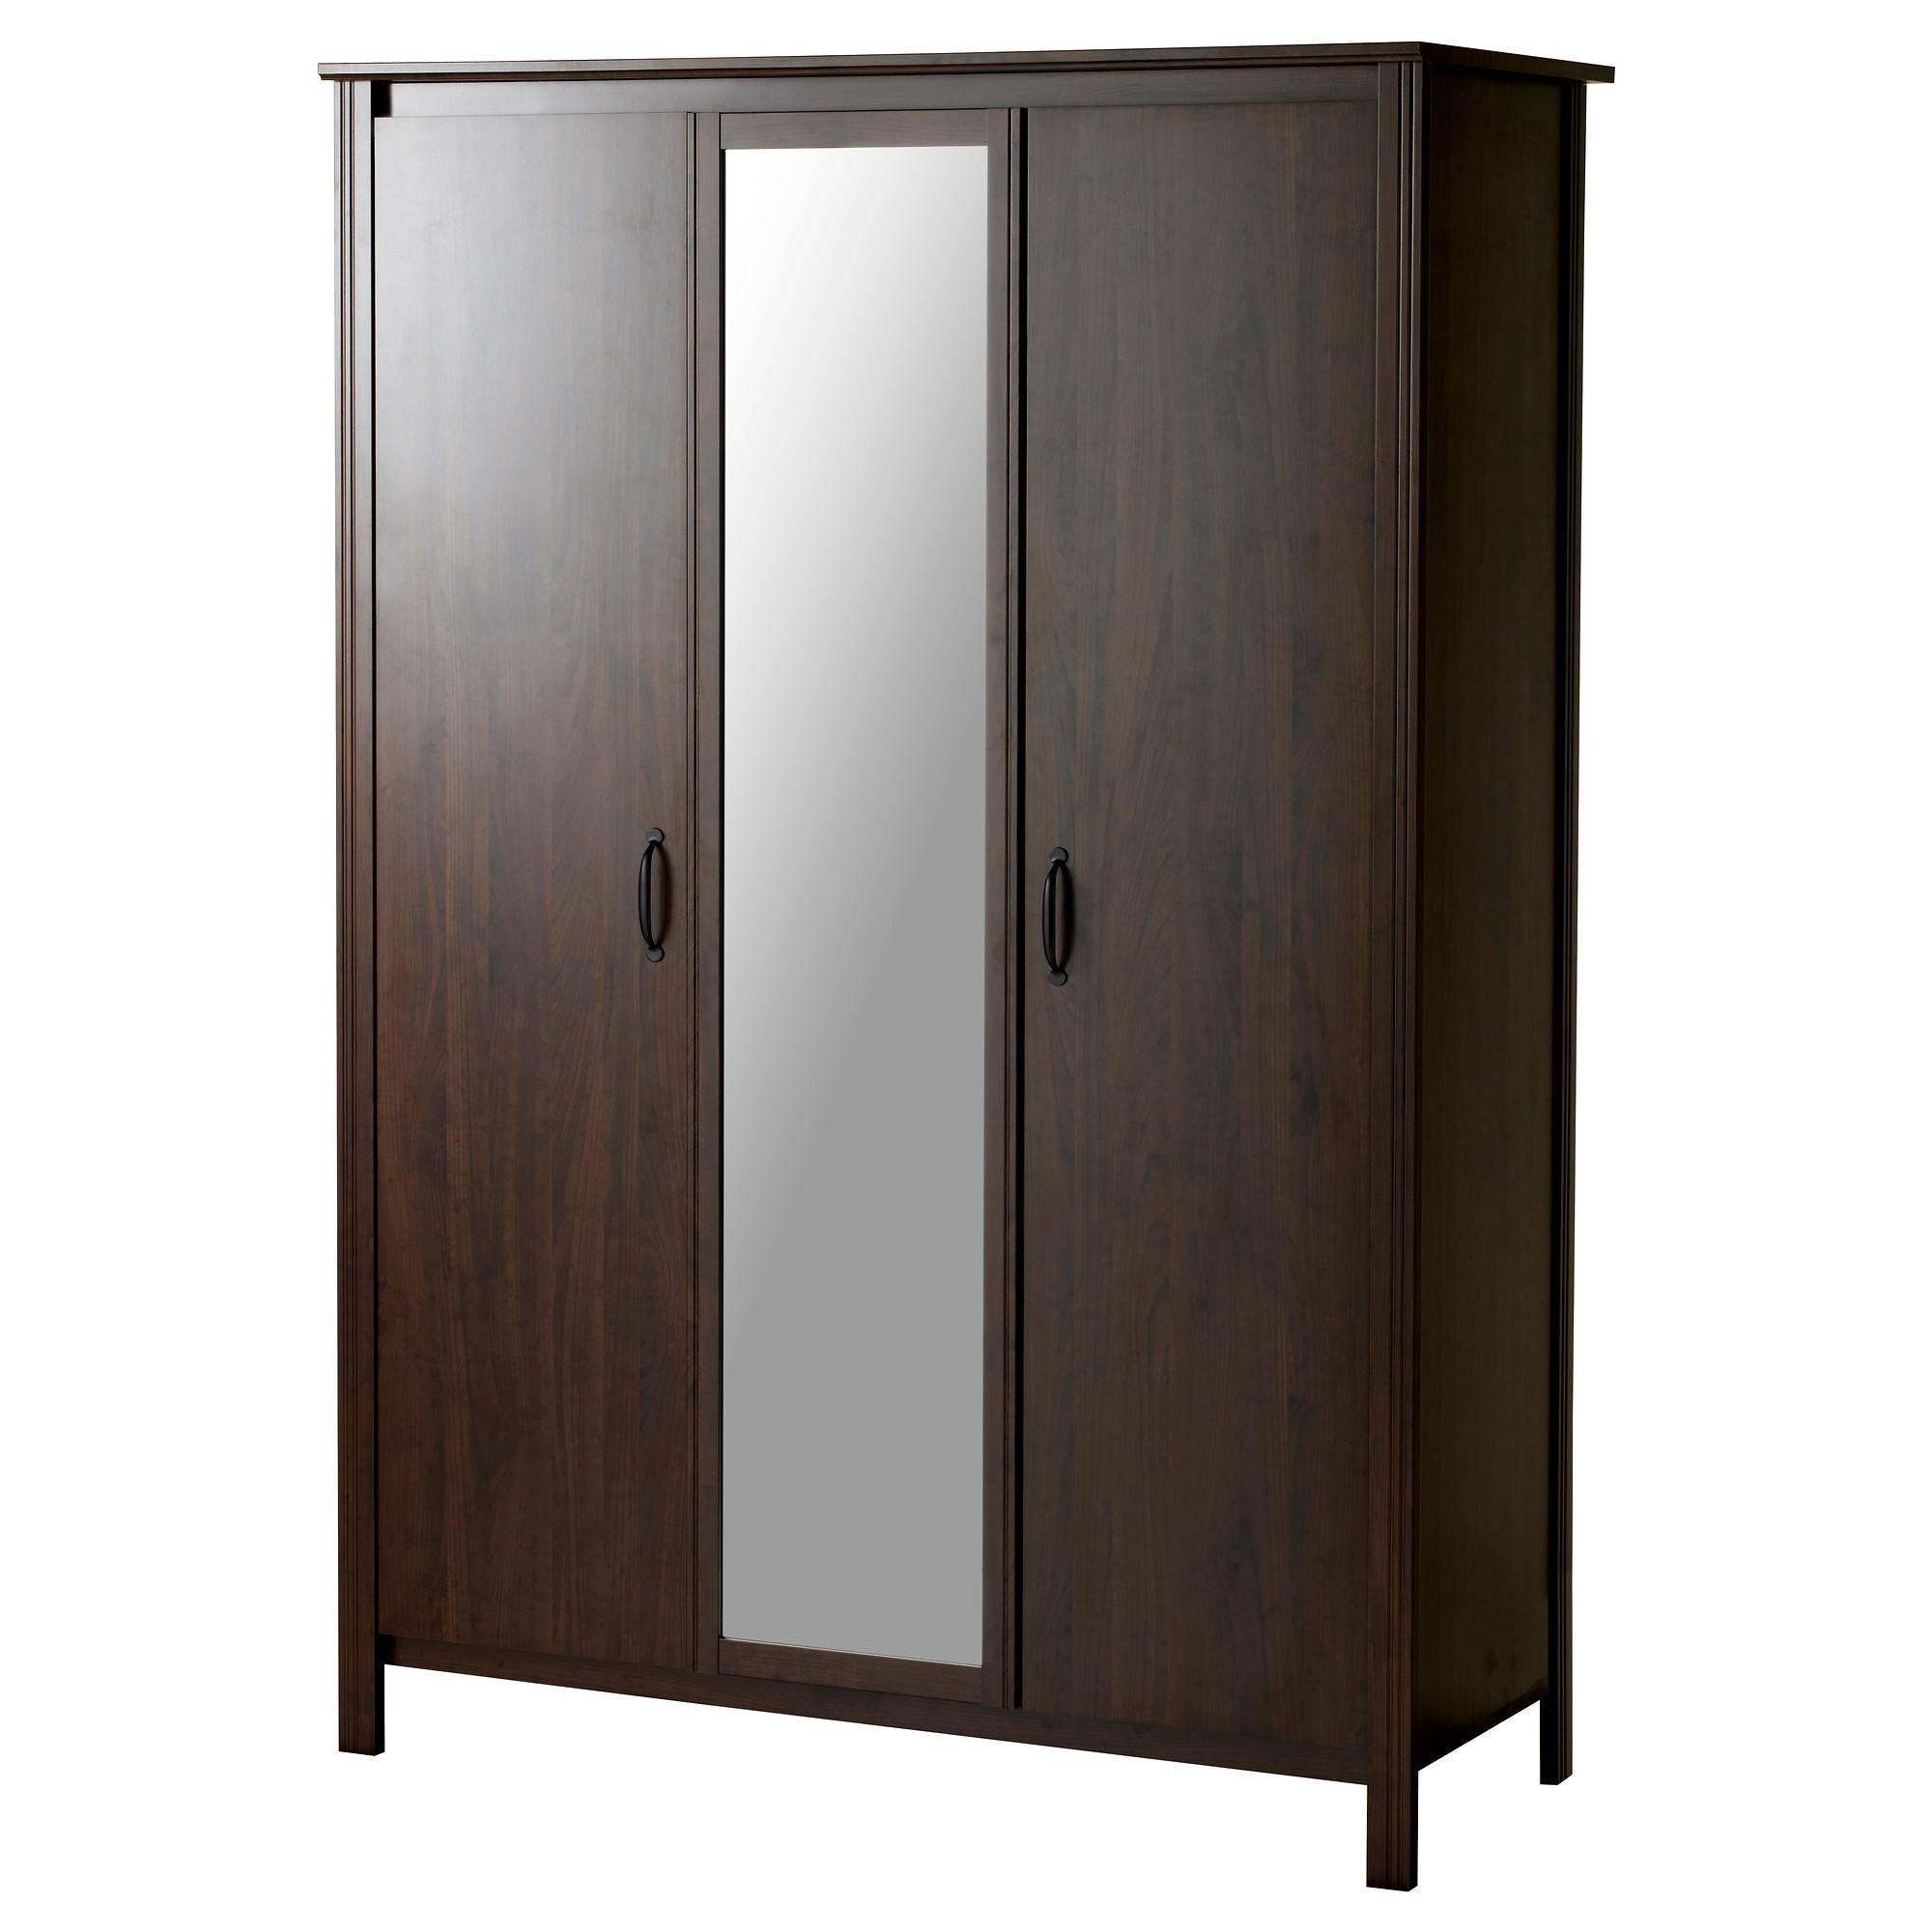 Bedroom : Black Wardrobe Sliding Door Wardrobe Black Armoire with regard to Large Black Wardrobes (Image 1 of 15)